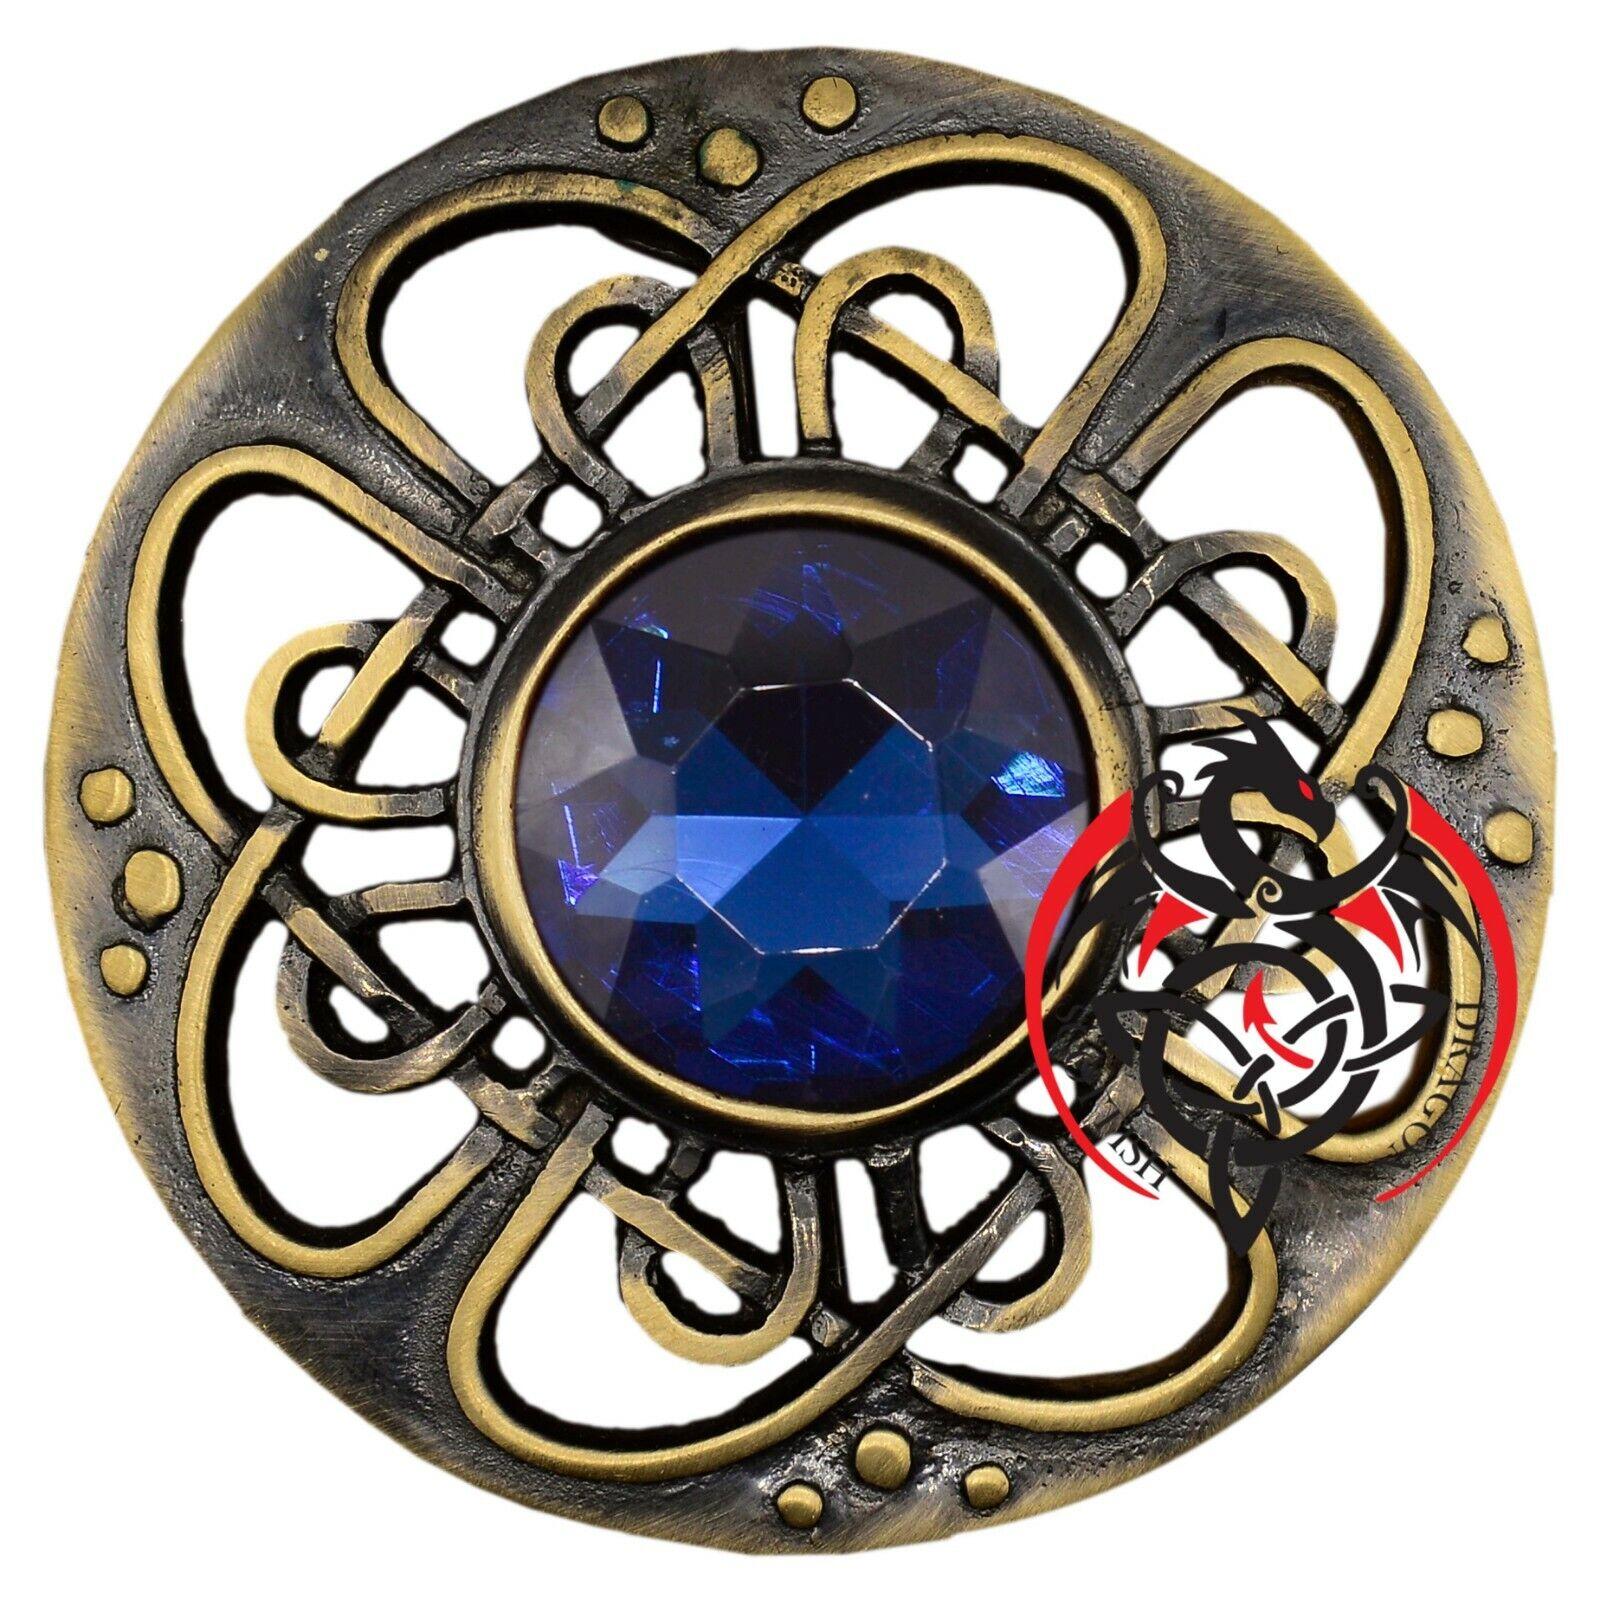 Highland Kilt Fly Plaid Brooch Blue Stone Antique Finish 3